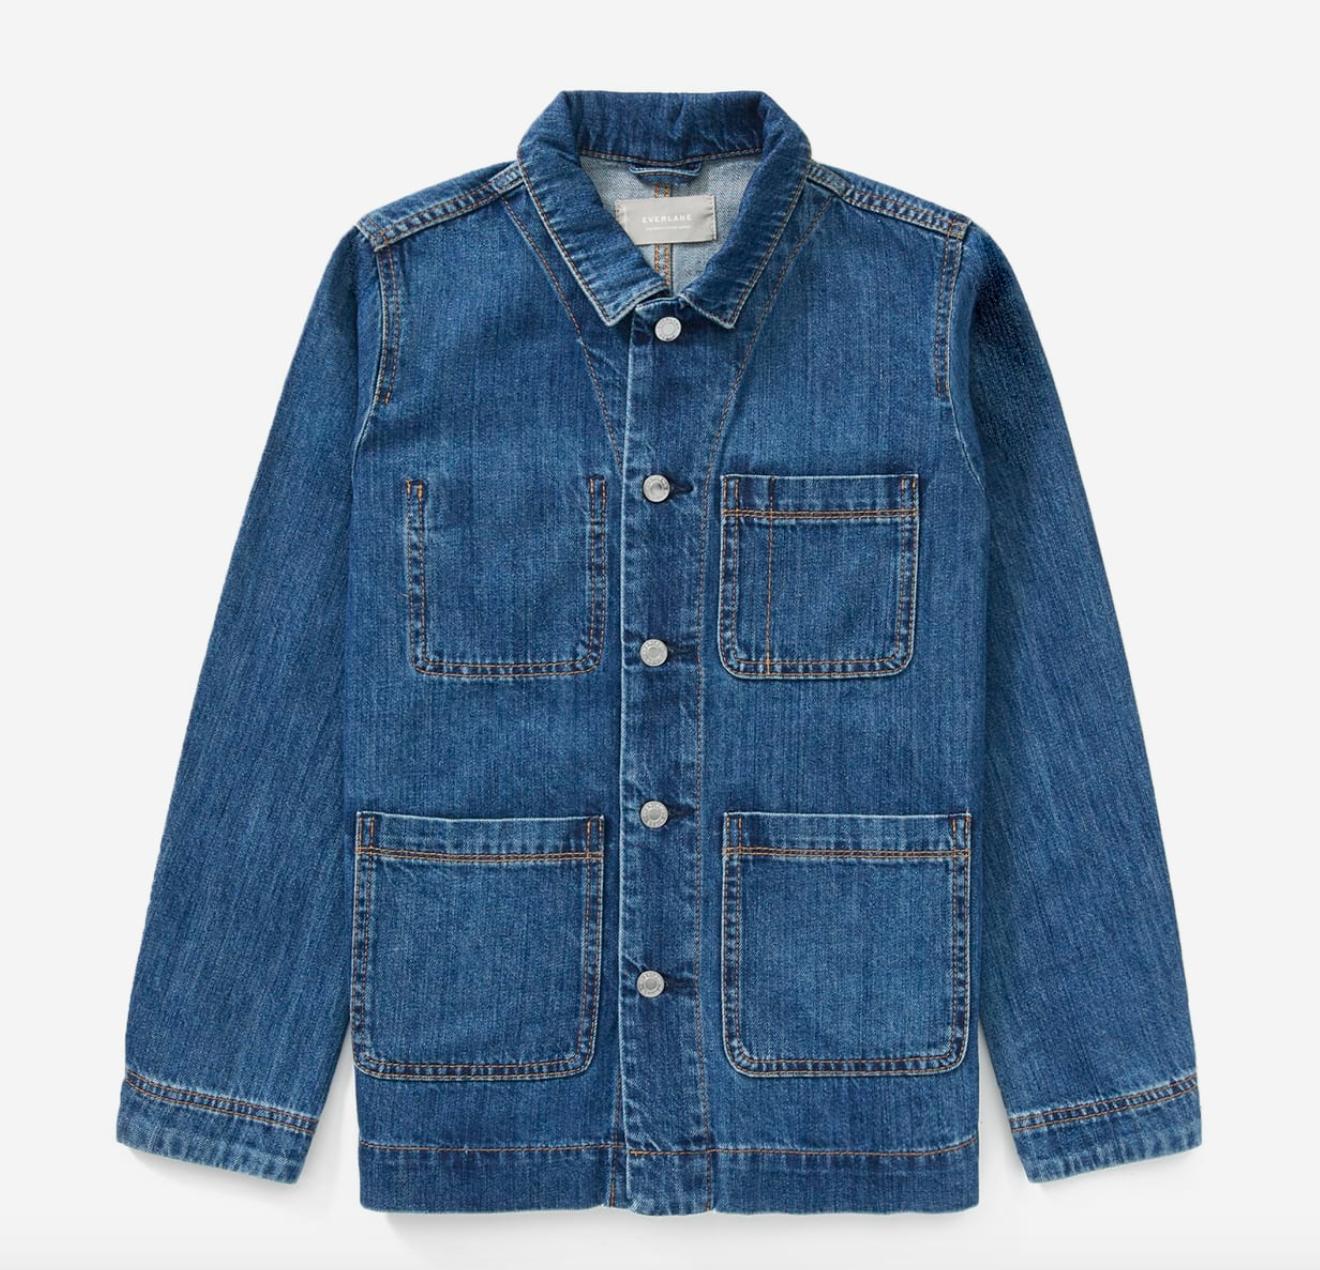 Everlane Women's Denim Chore Jacket